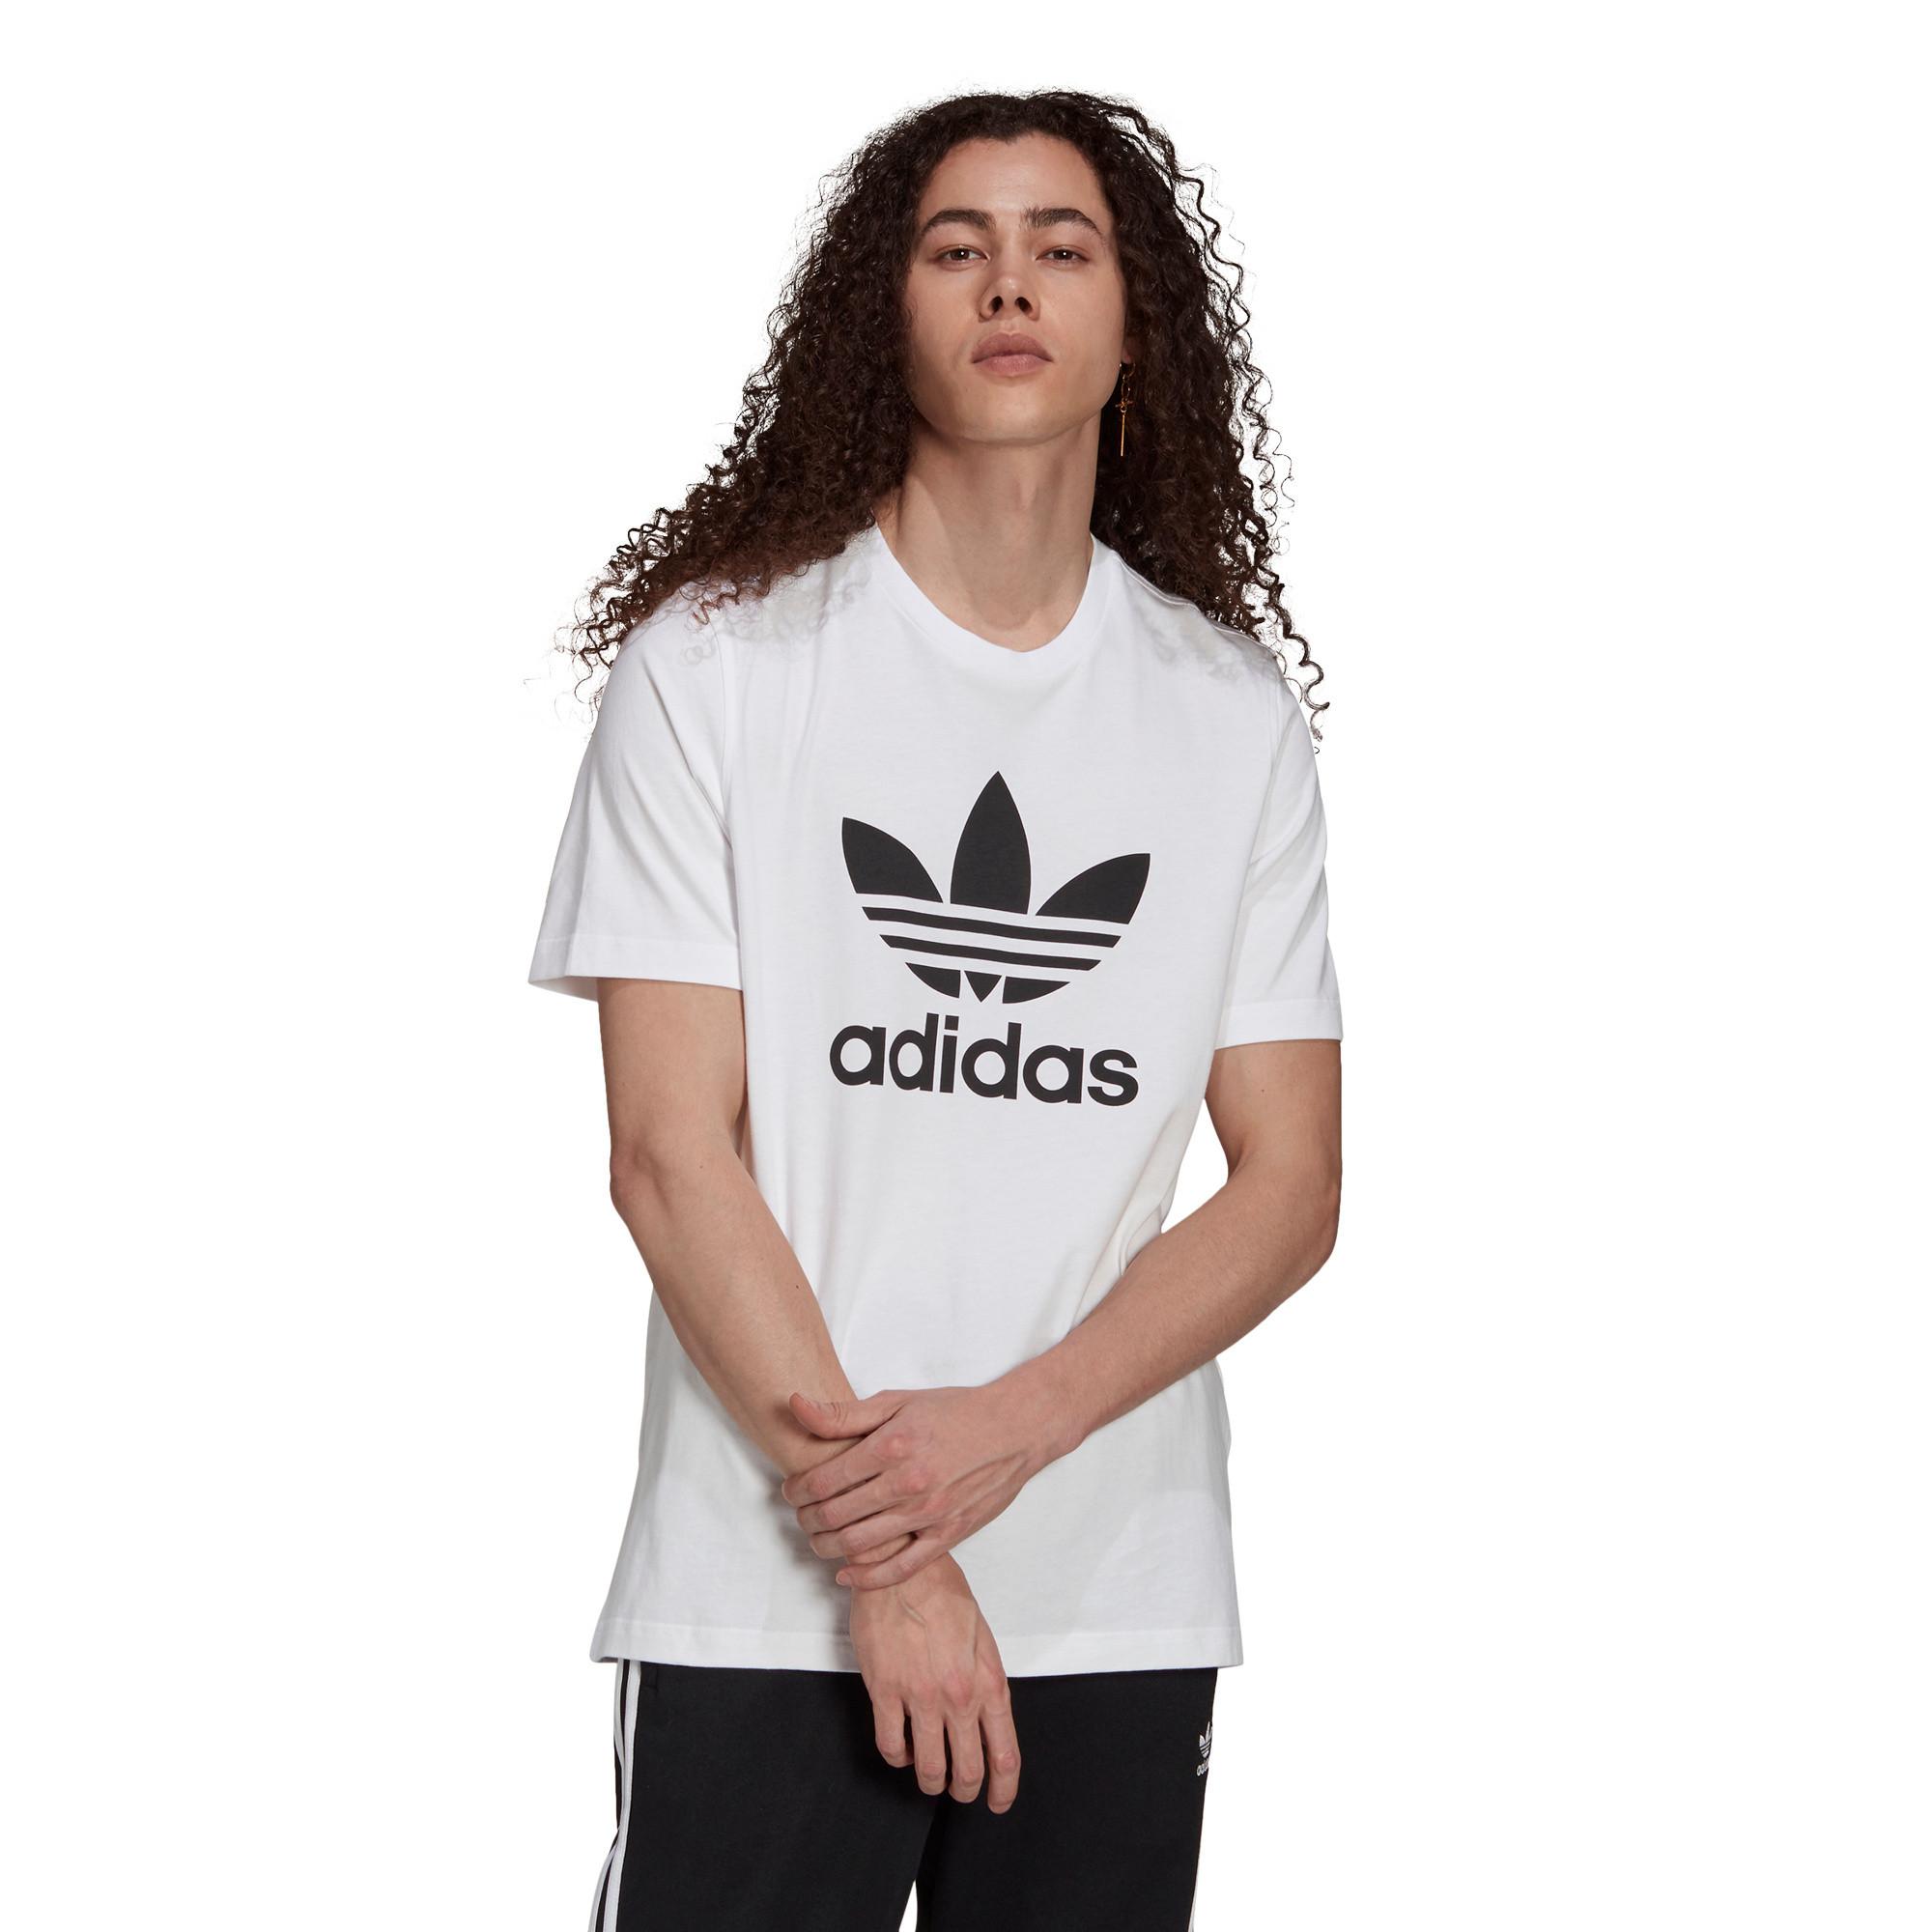 T-shirt uomo adicolor Classics Trefoil, Bianco/Nero, large image number 1